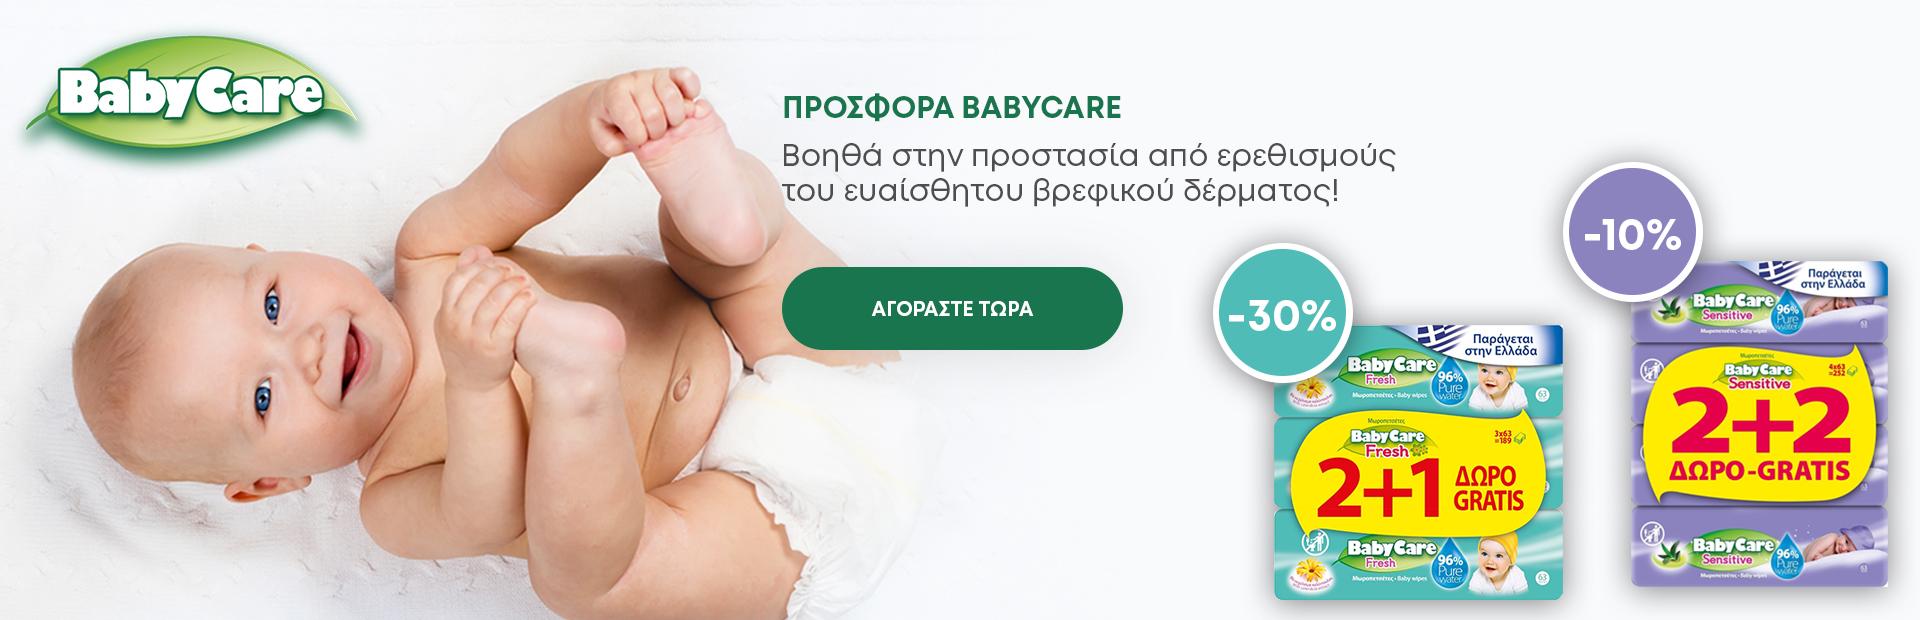 BABYCARE ΜΩΡΟΜΑΝΤΗΛΑ